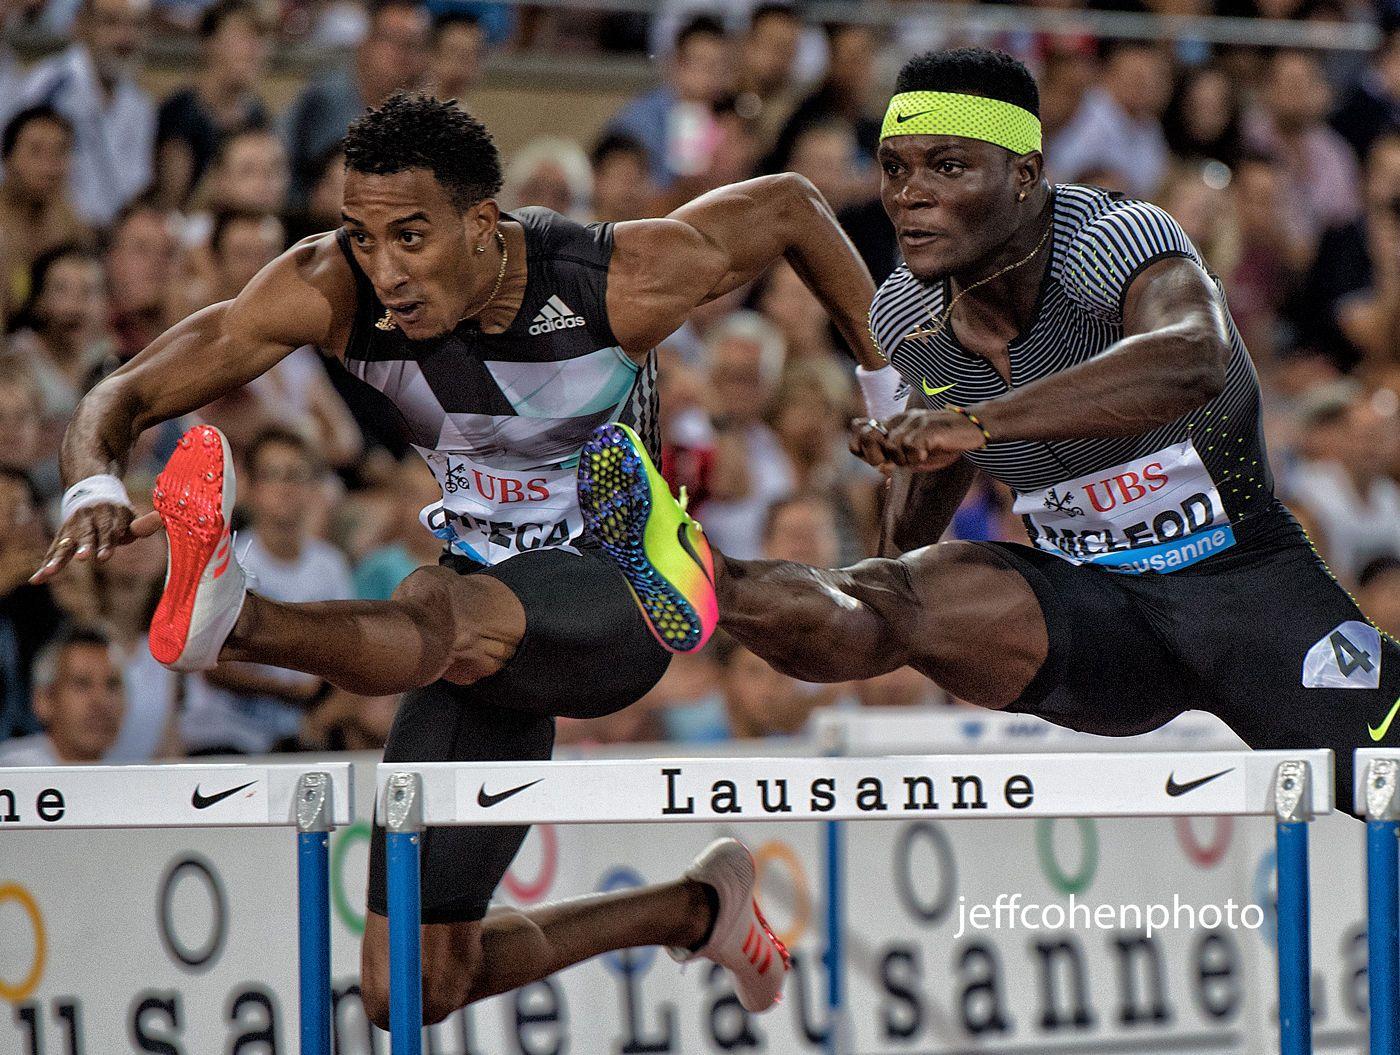 1r2016_athletissima_lausanne_ortega_mccleod_110mh_jeff_cohen_photo_2101_web.jpg